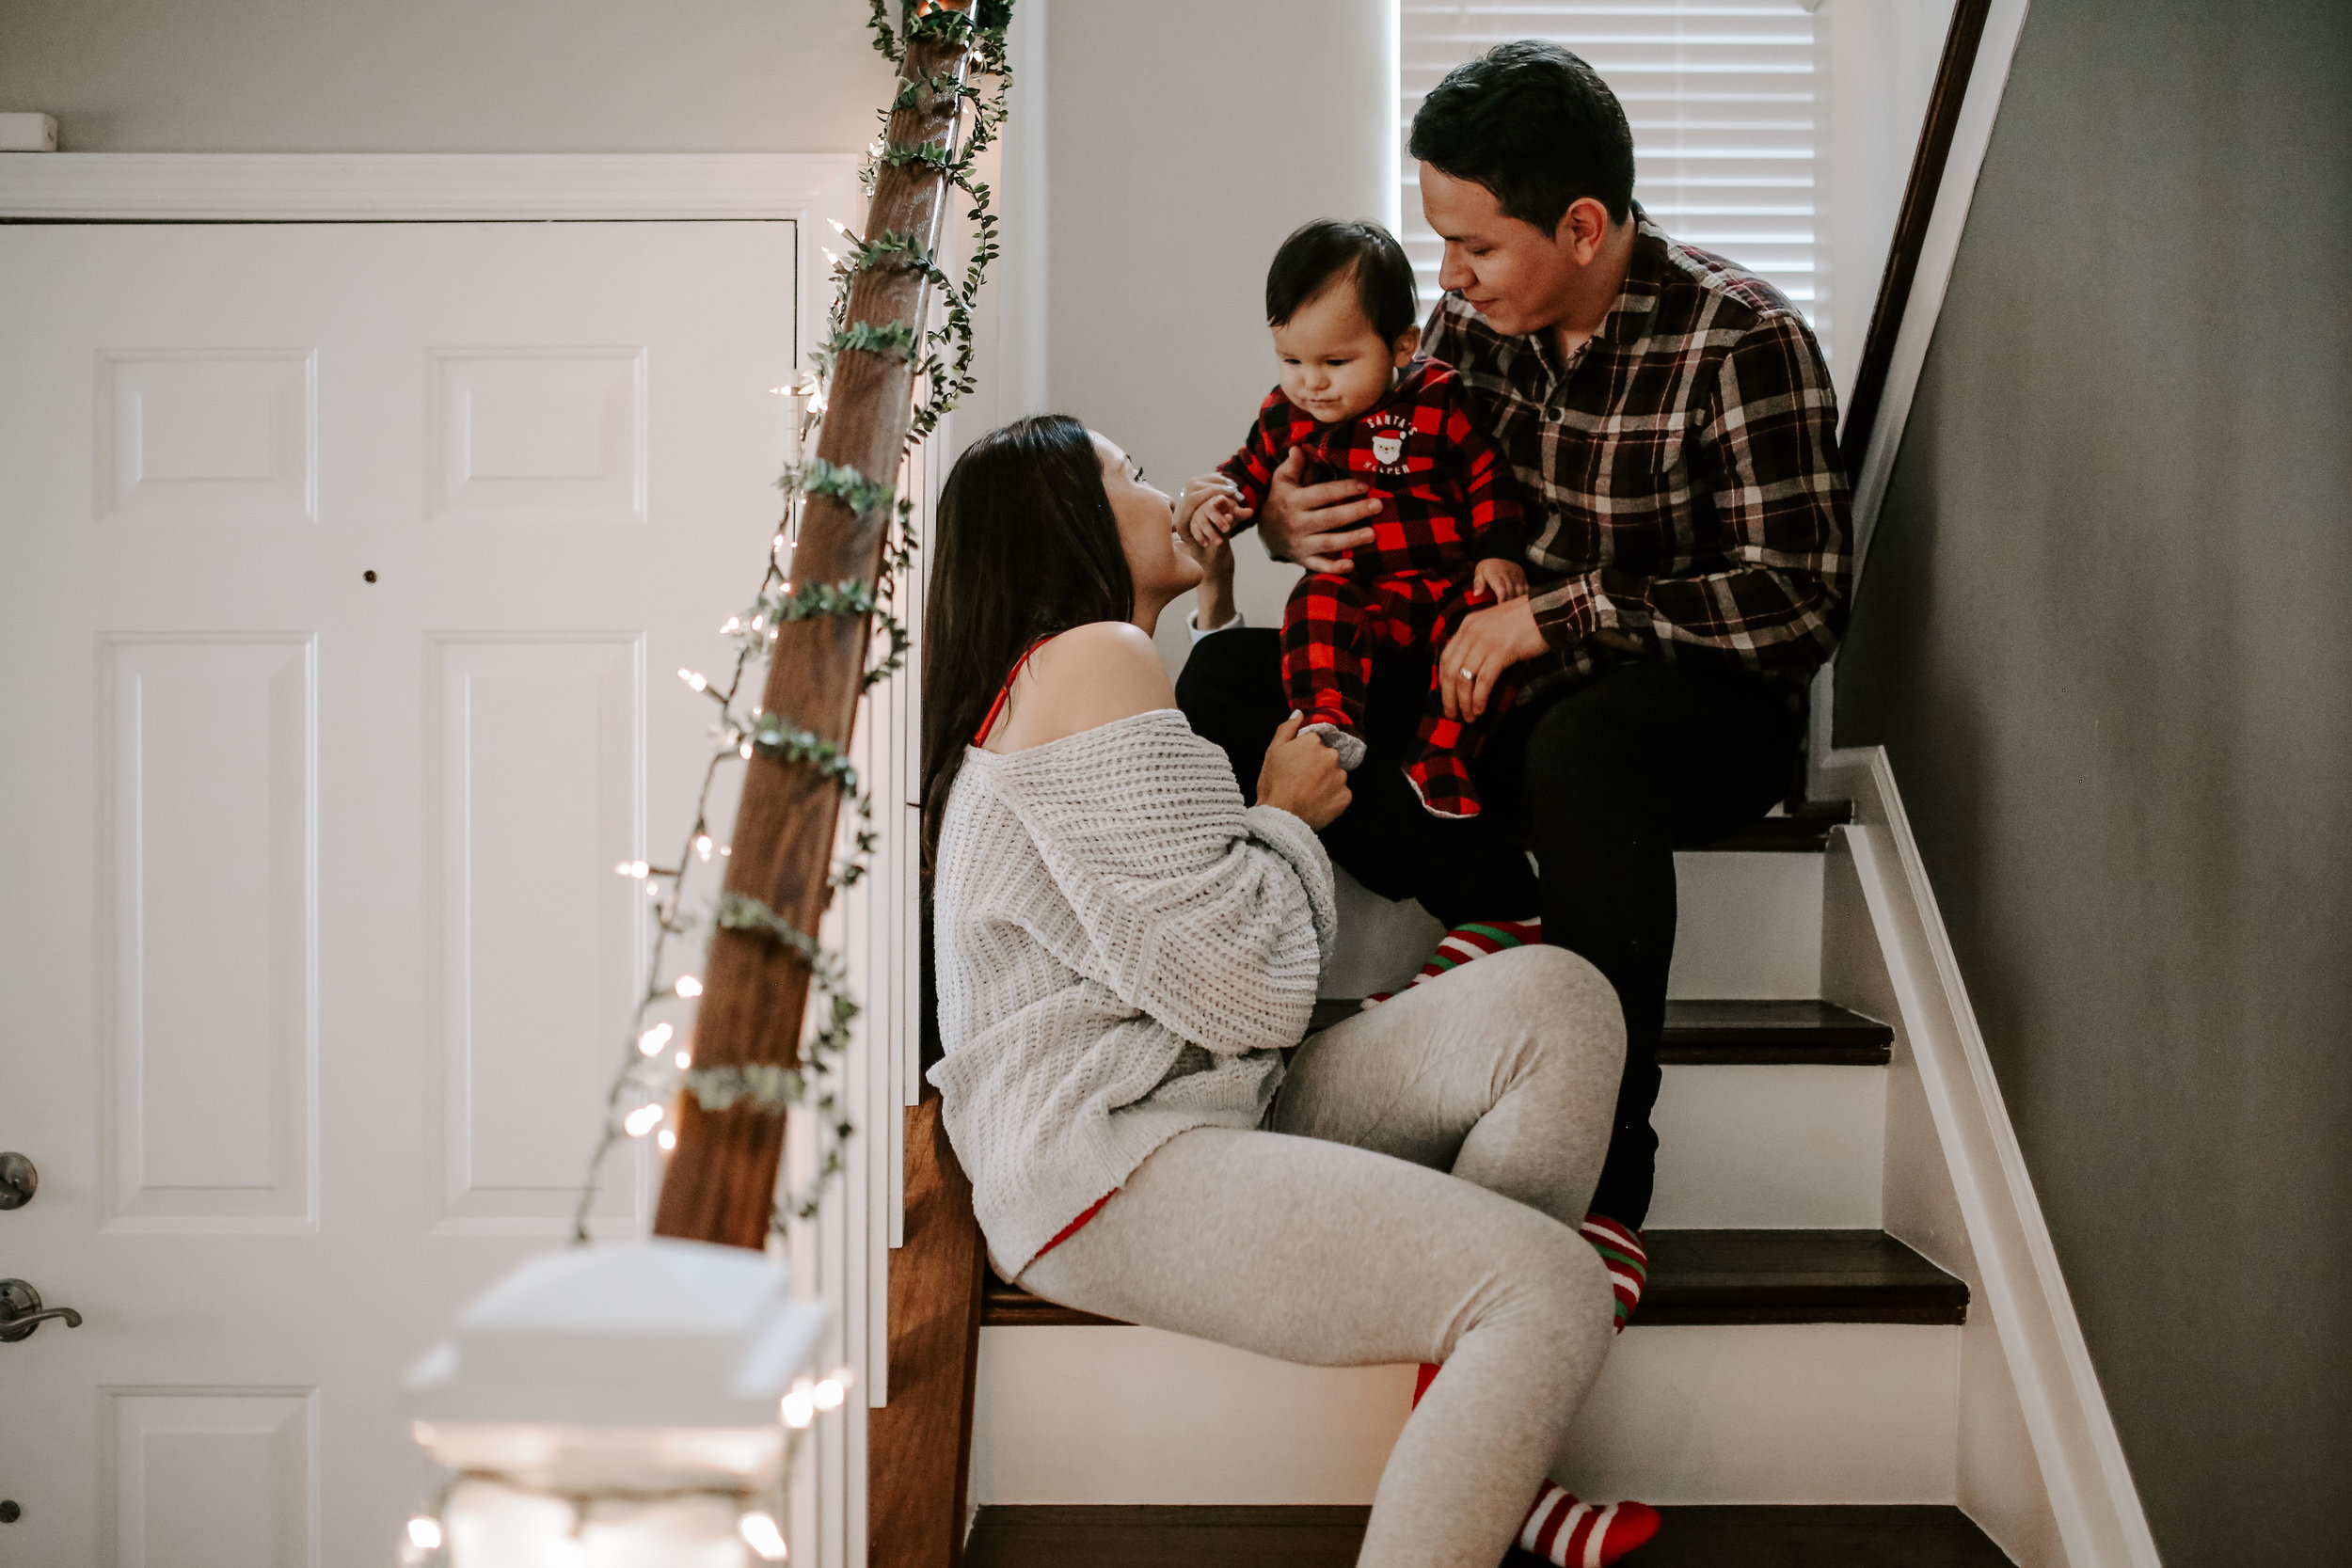 Camacho's_Christmas_2018-110.jpg